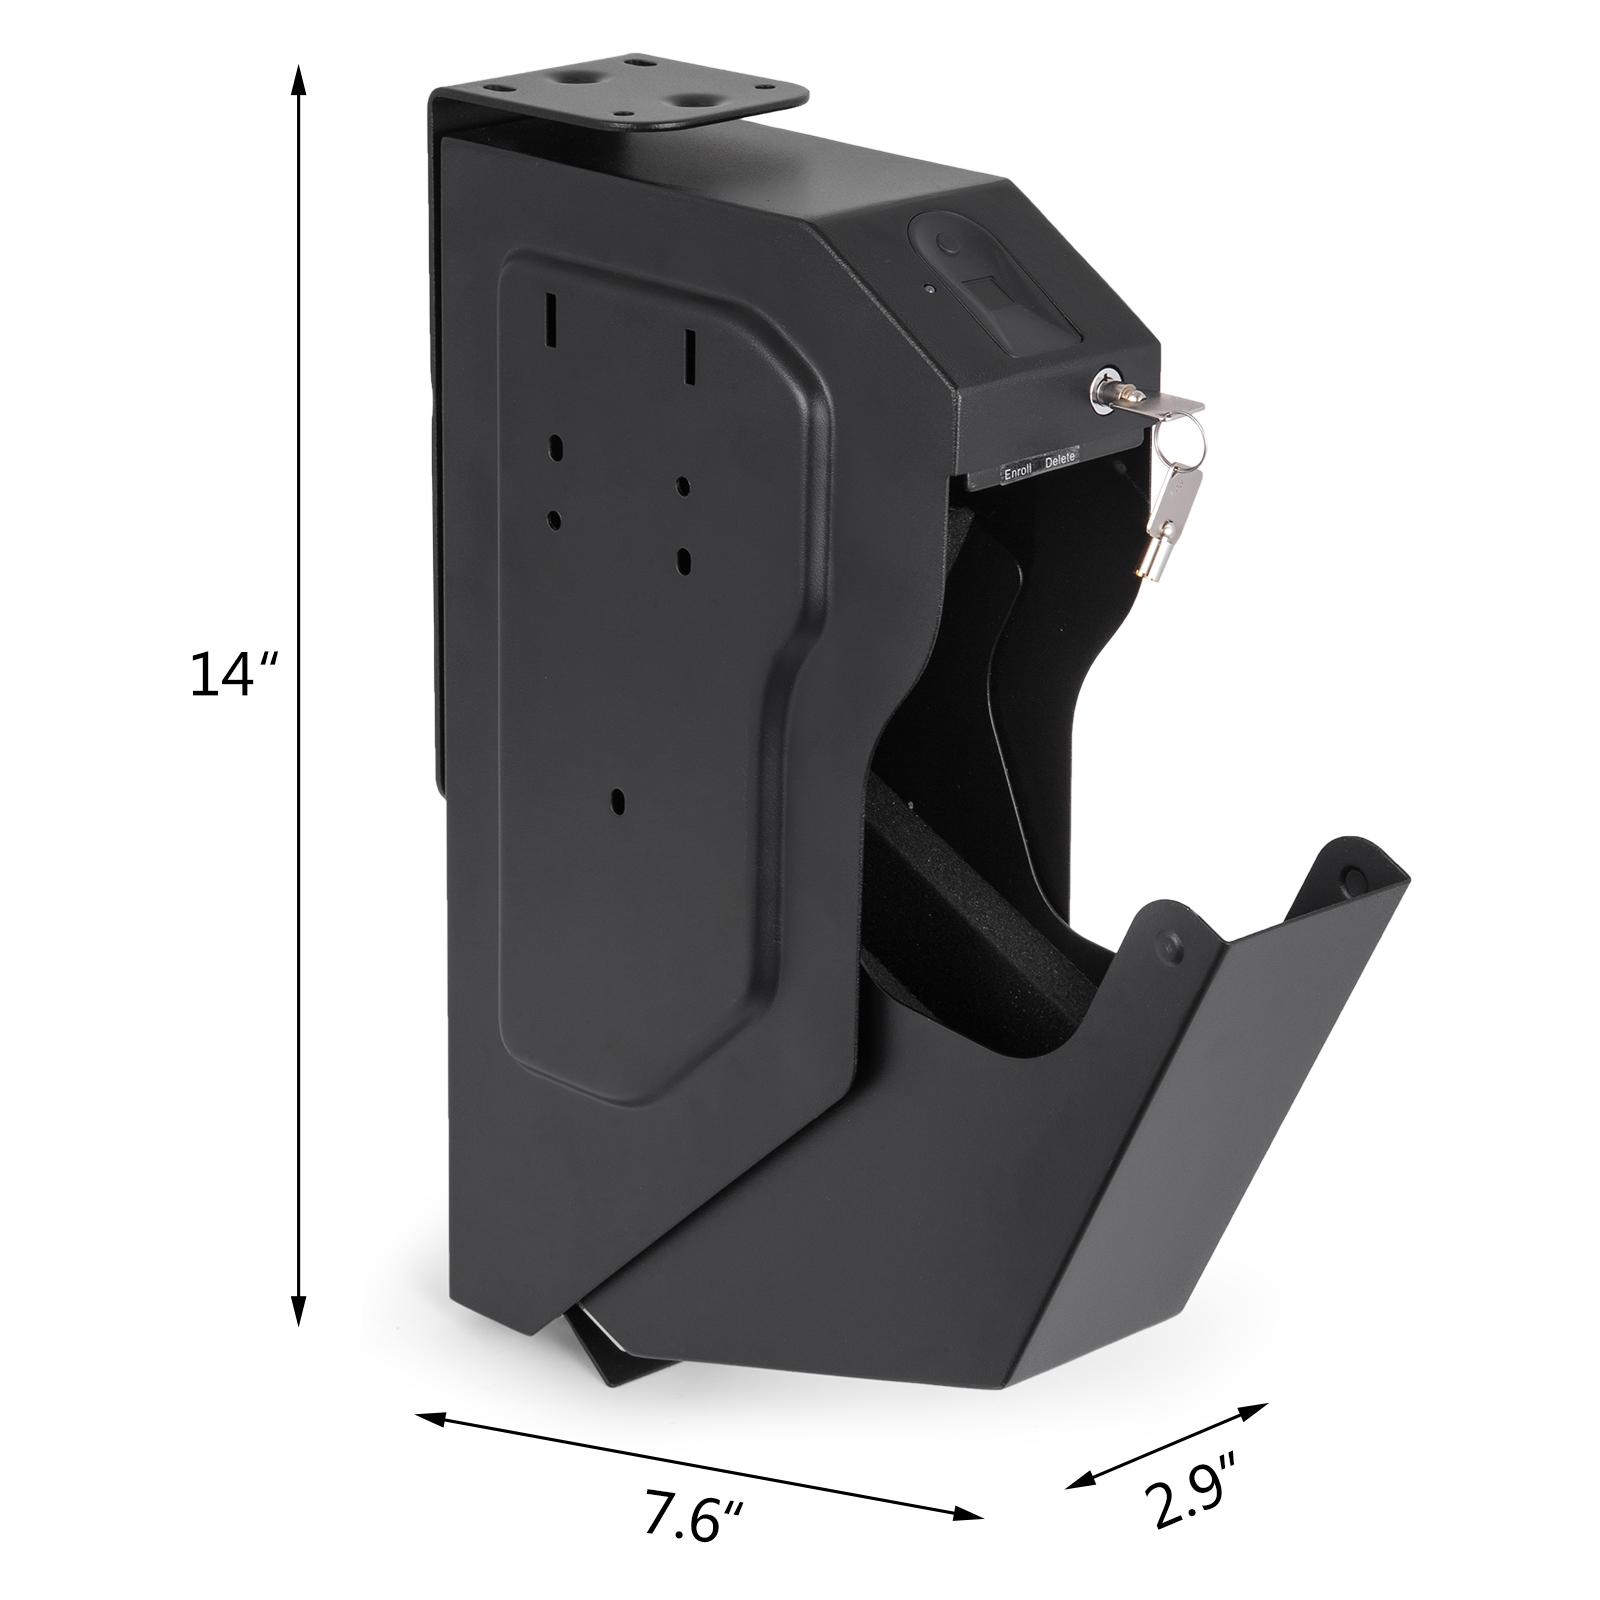 Pistol-Safe-Hand-Gun-Safe-Box-Biometric-Fingerprint-Storage-Home-Office-Security thumbnail 2